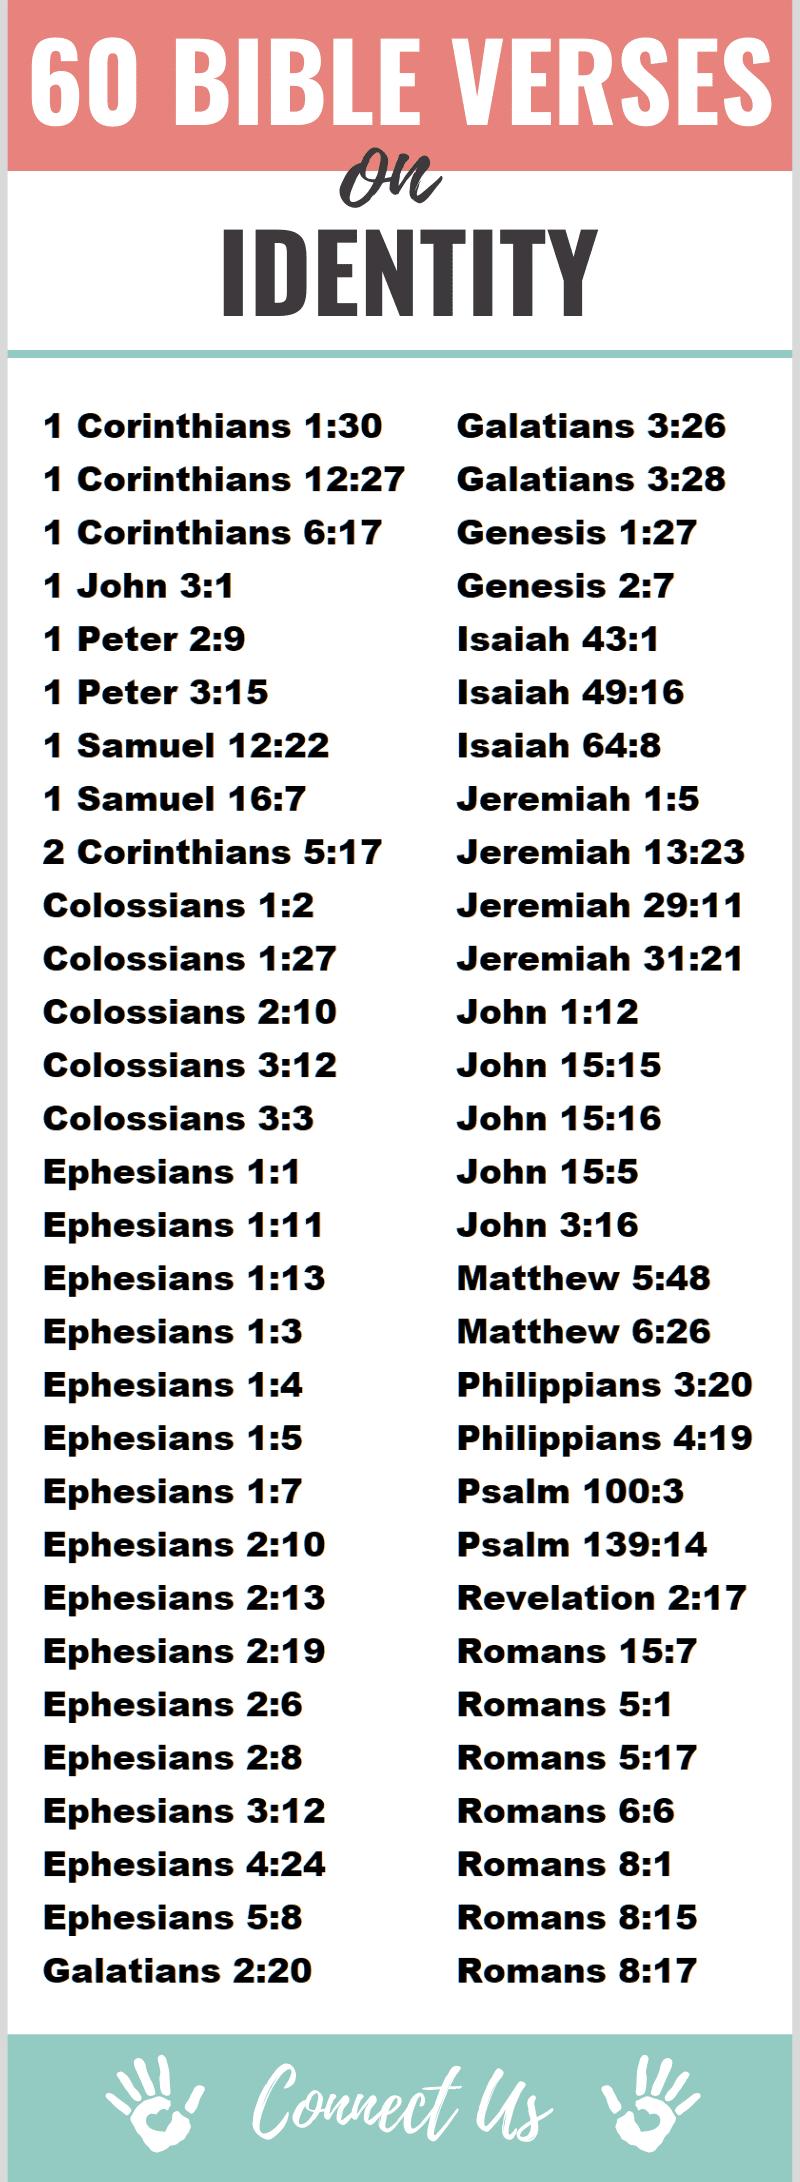 Bible Verses on Identity